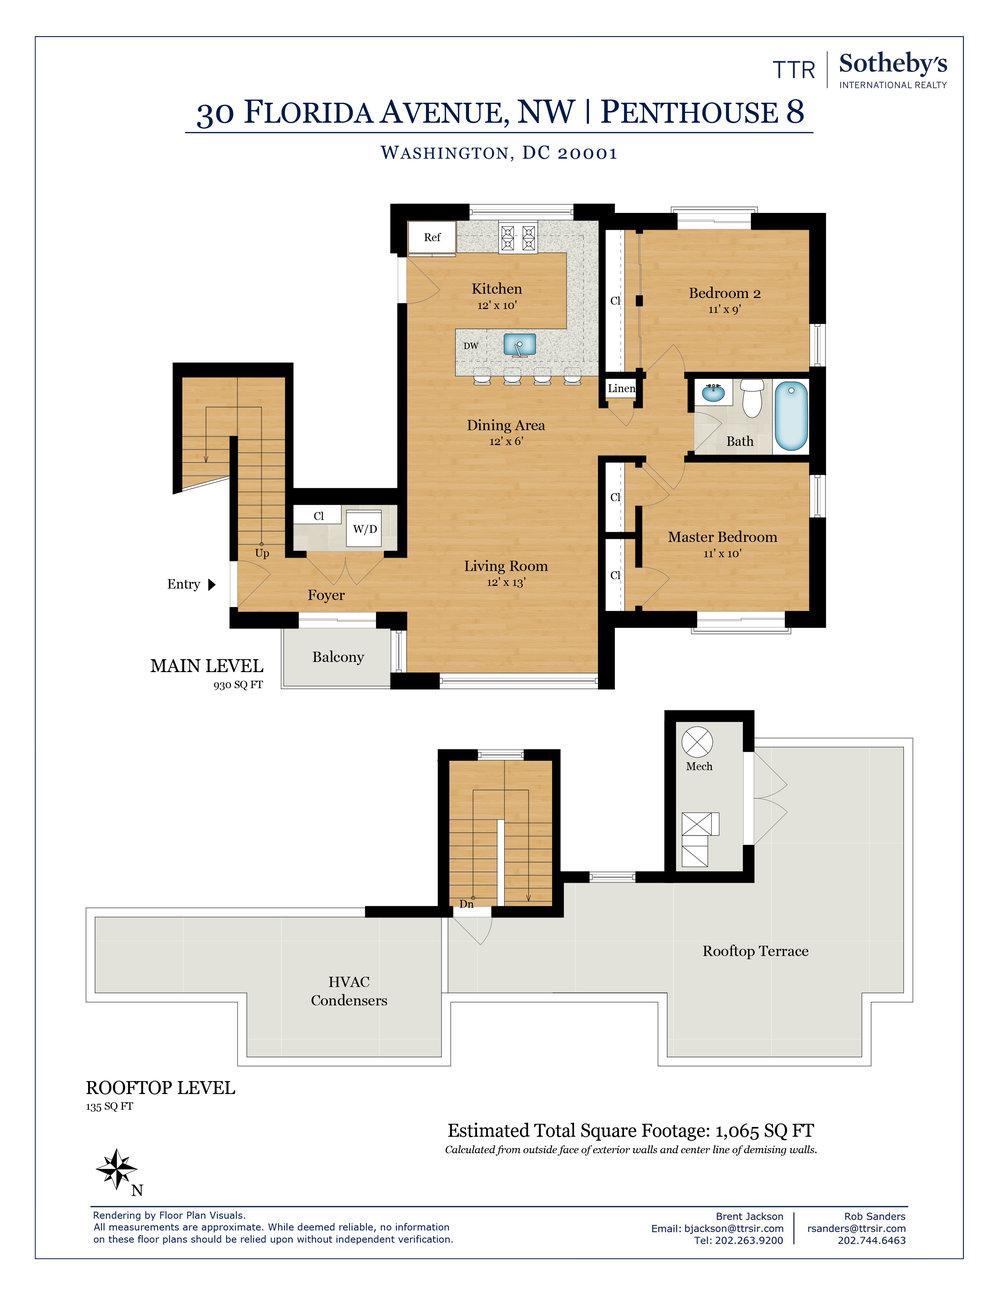 BJ-30FloridaAveNW#8-FloorPlan-Print-R1.jpg